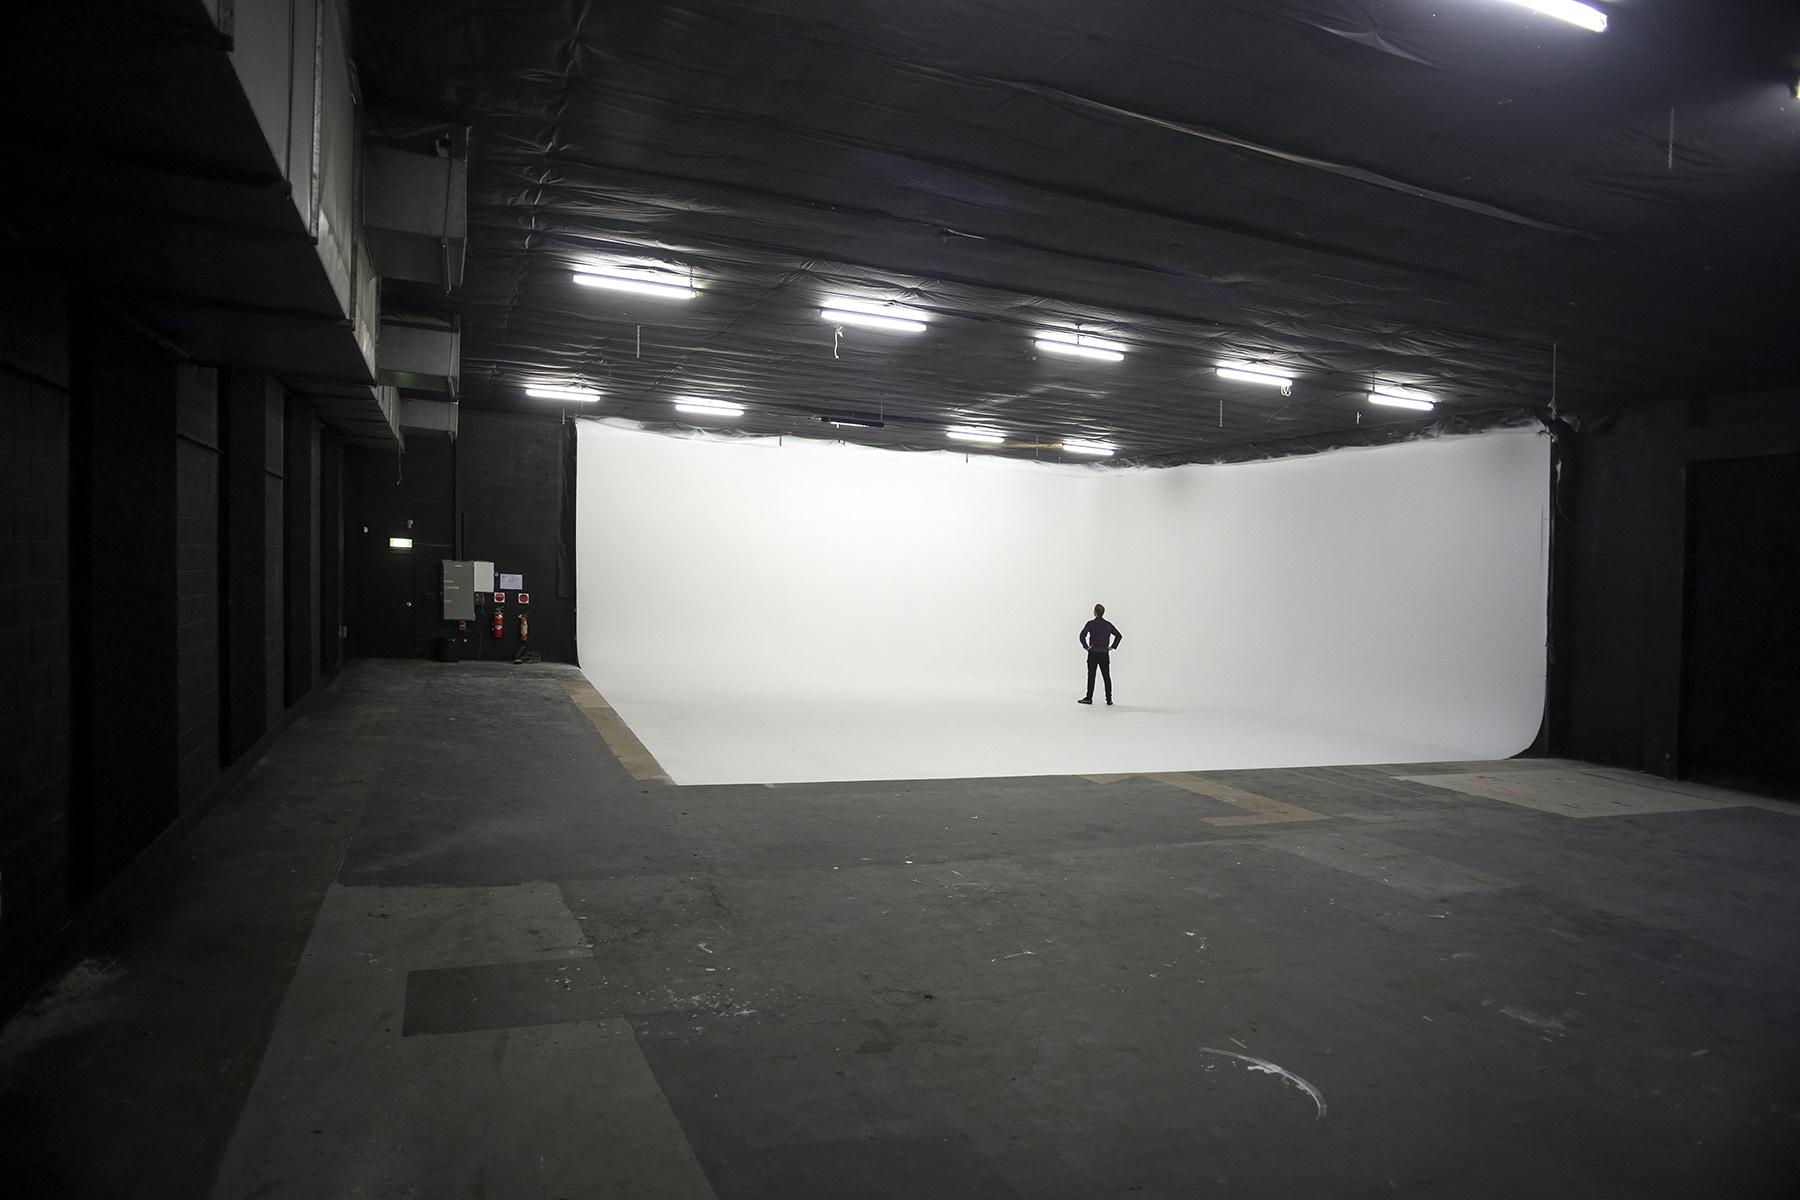 Hendon Studios Sound Stage 2